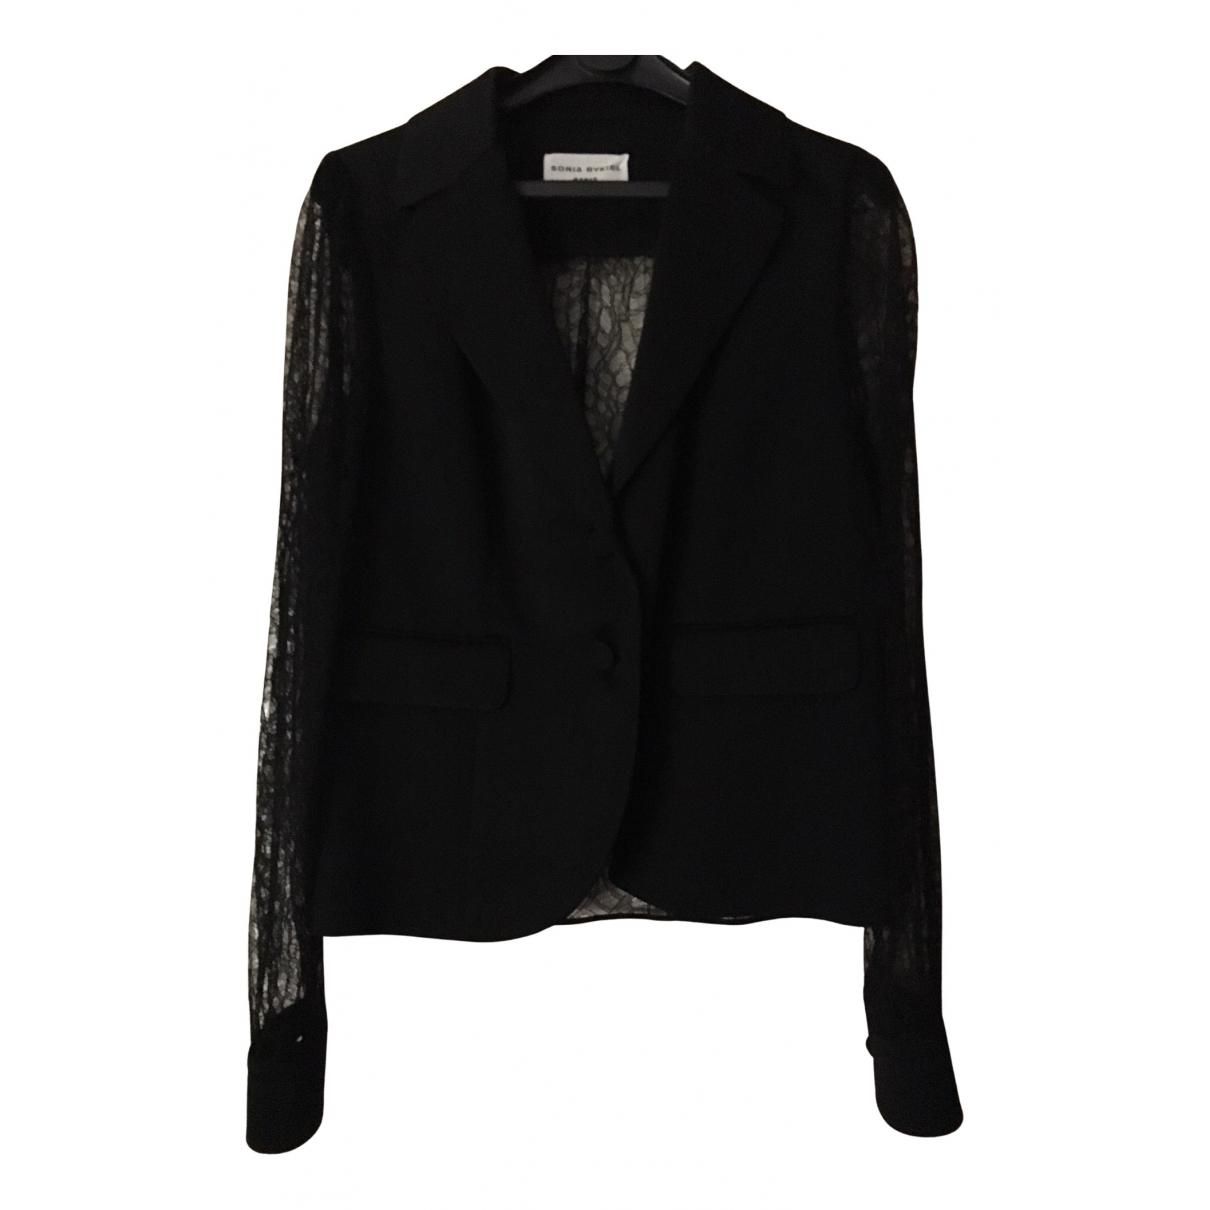 Sonia Rykiel N Black jacket for Women 42 FR